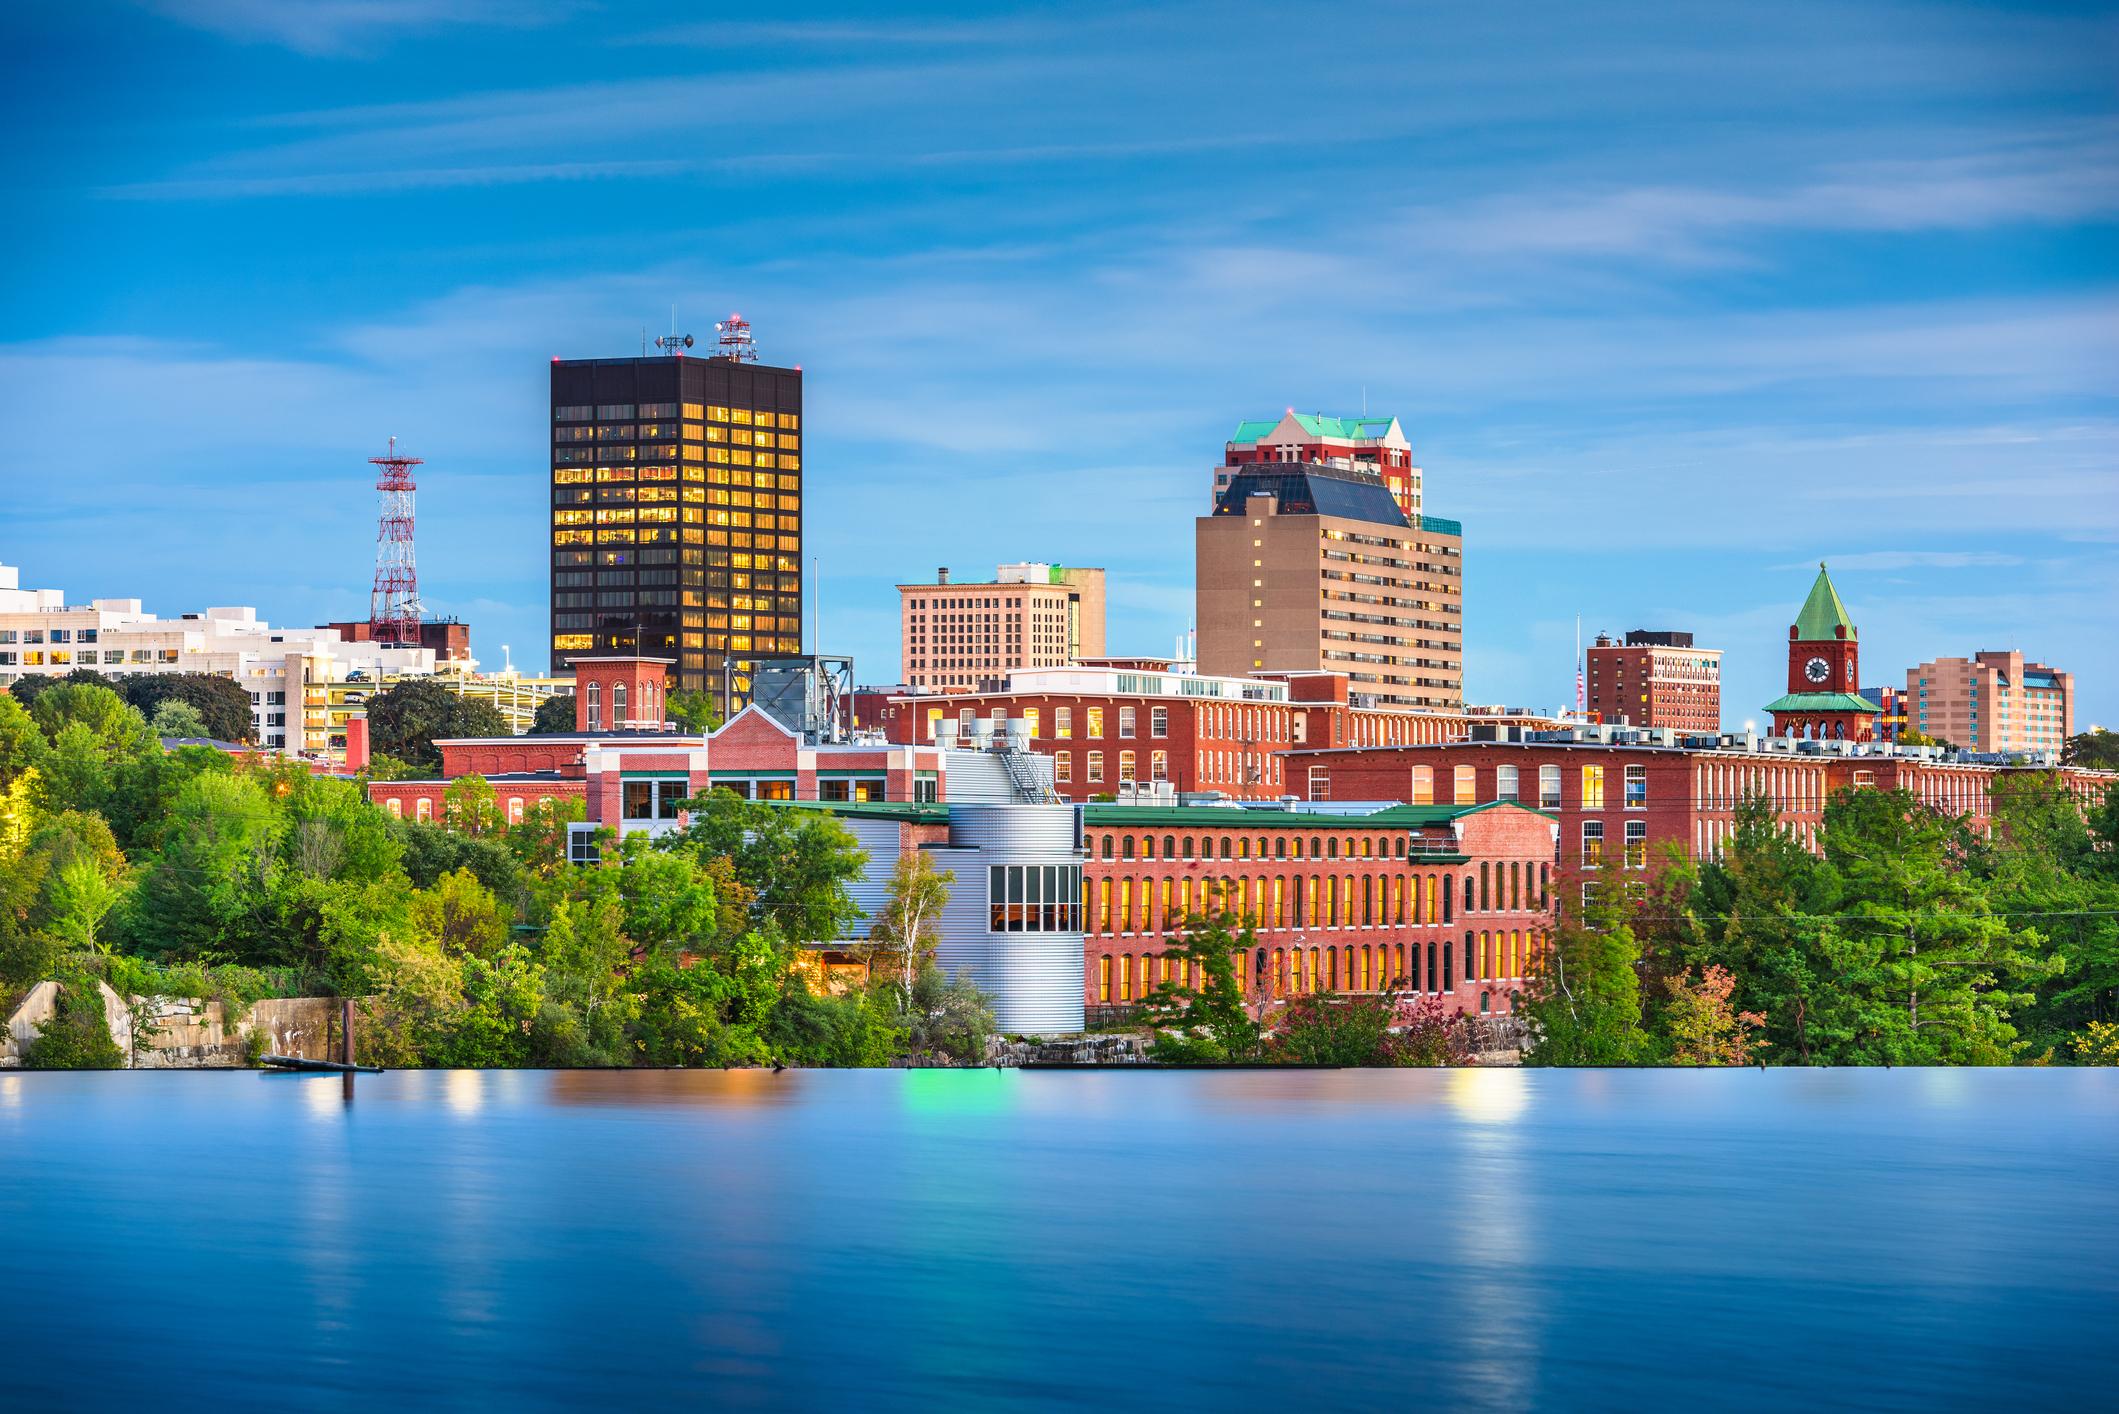 Manchester, New Hampshire skyline